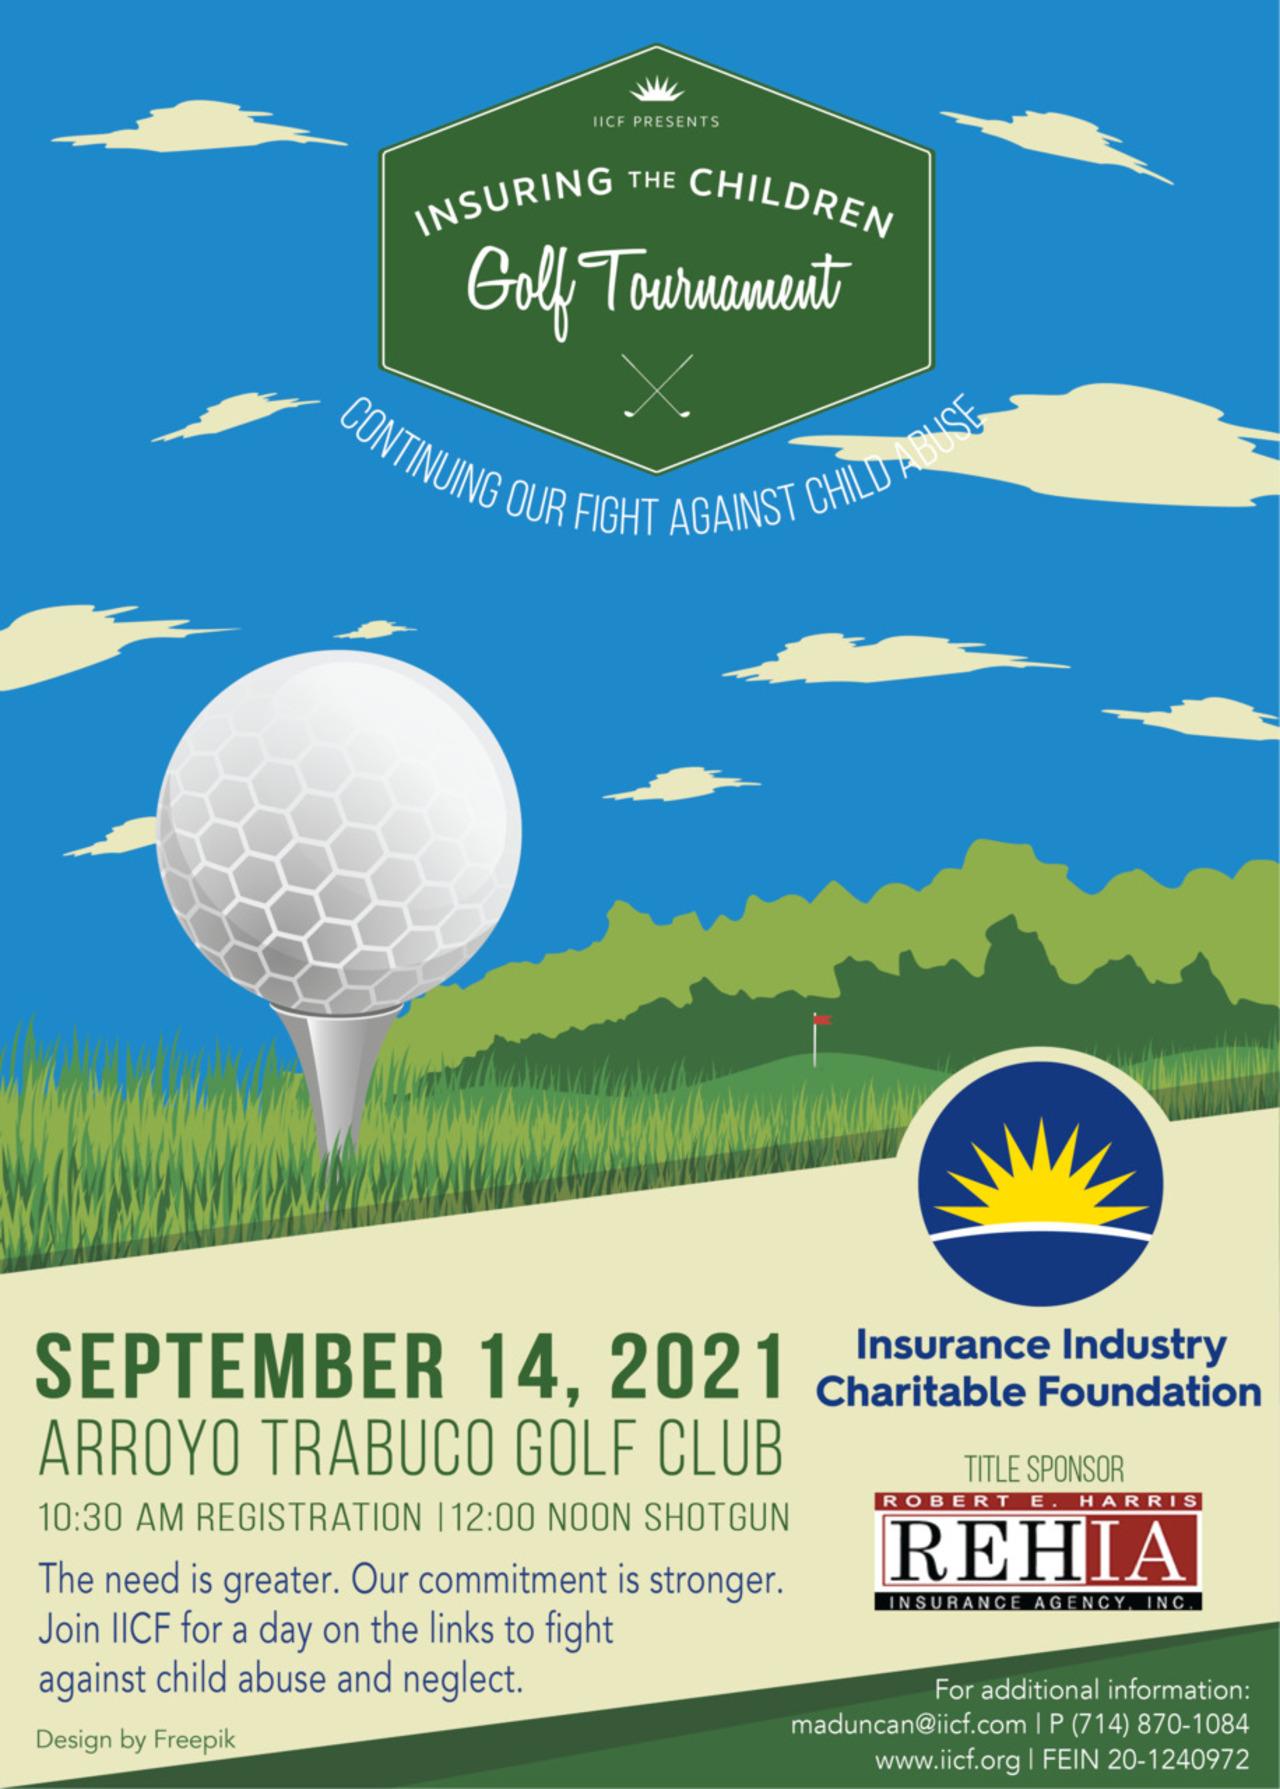 IICF ITC Golf Tournament 2021